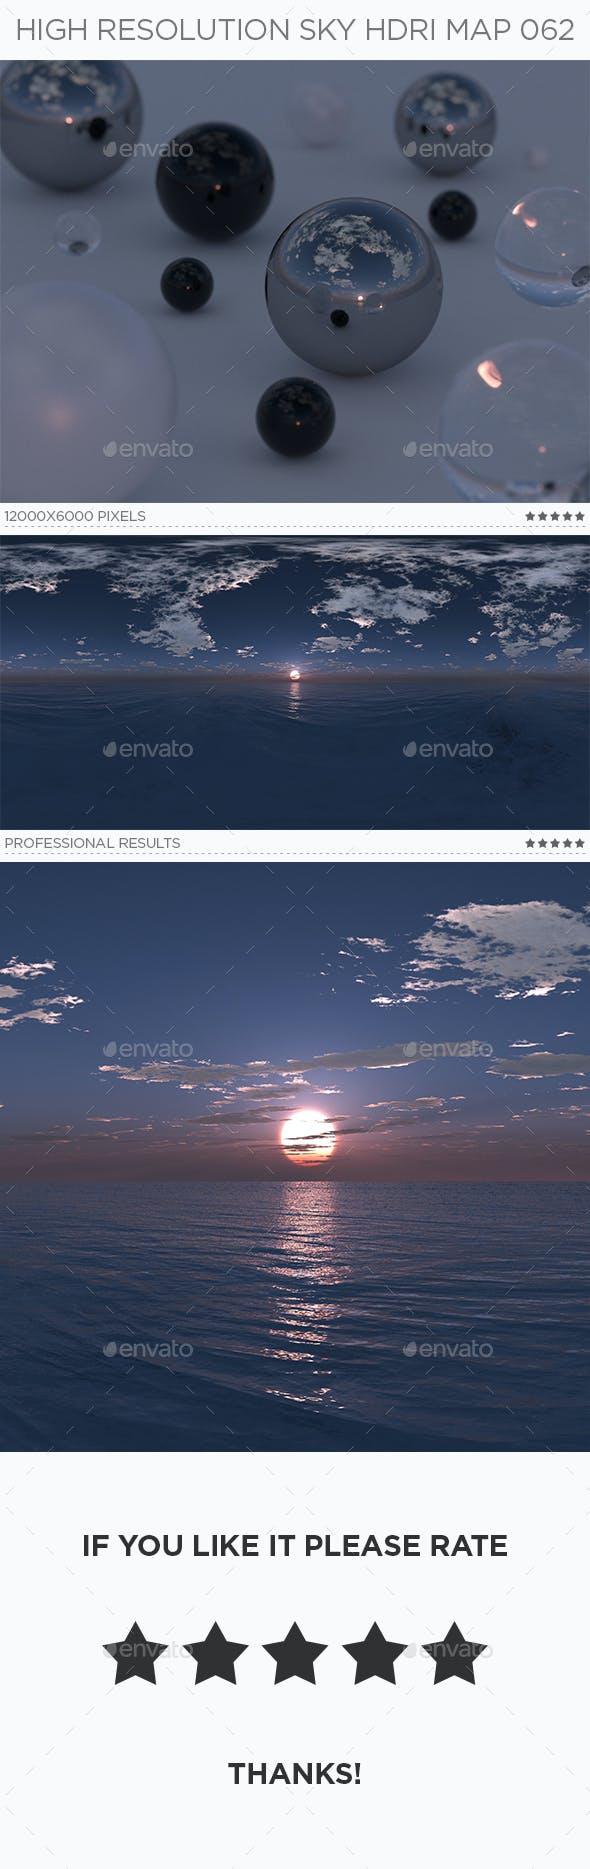 High Resolution Sky HDRi Map 062 - 3DOcean Item for Sale